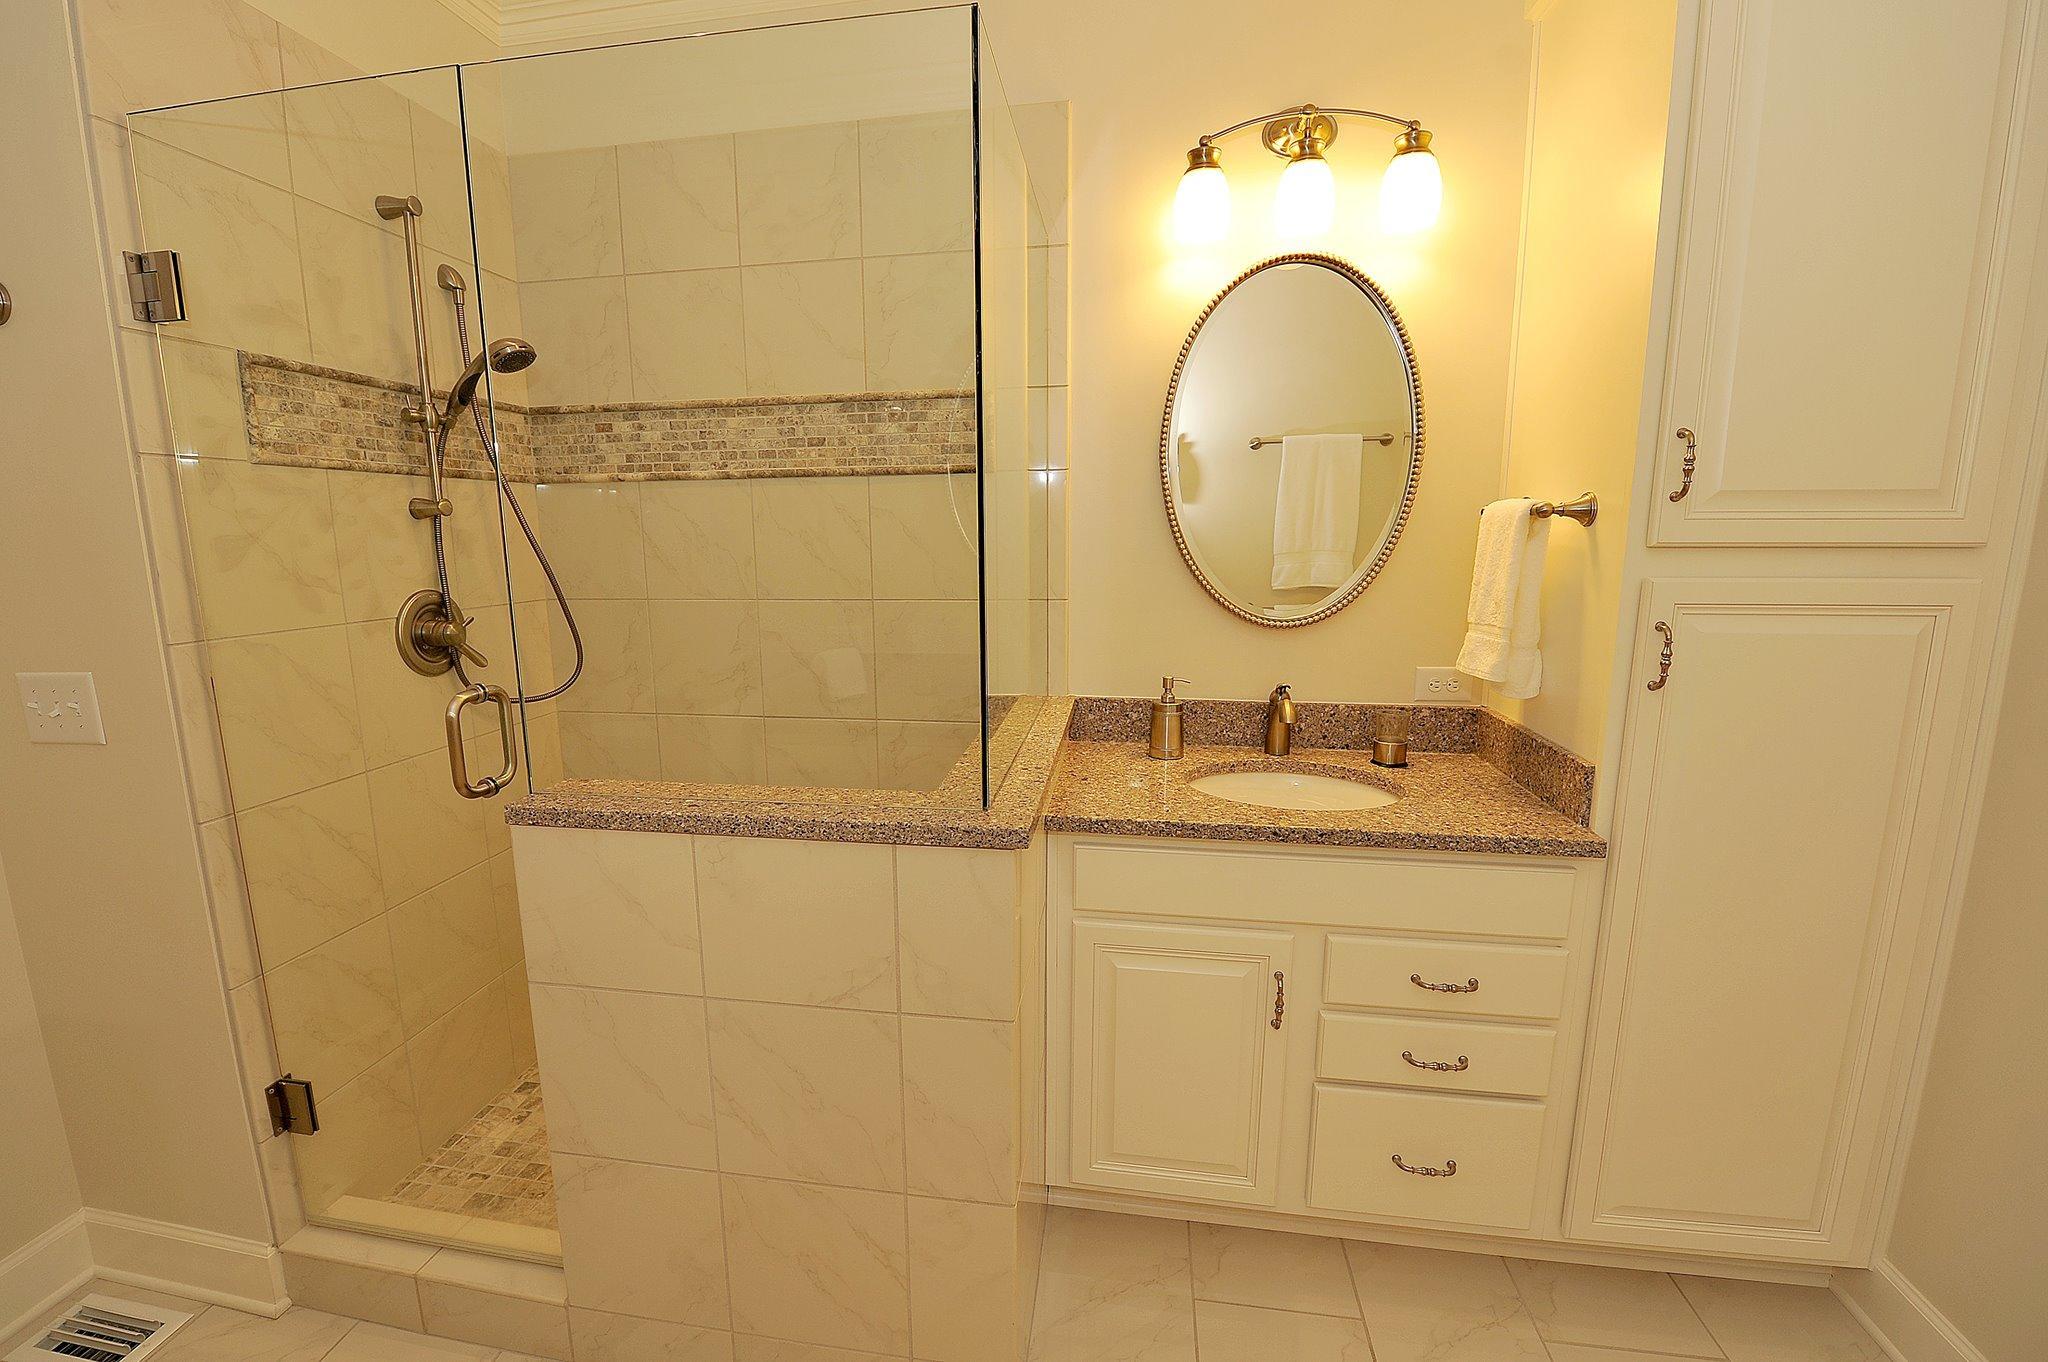 bathroom pics birmingham of remodeling best al ideas fishingforcatfishfo